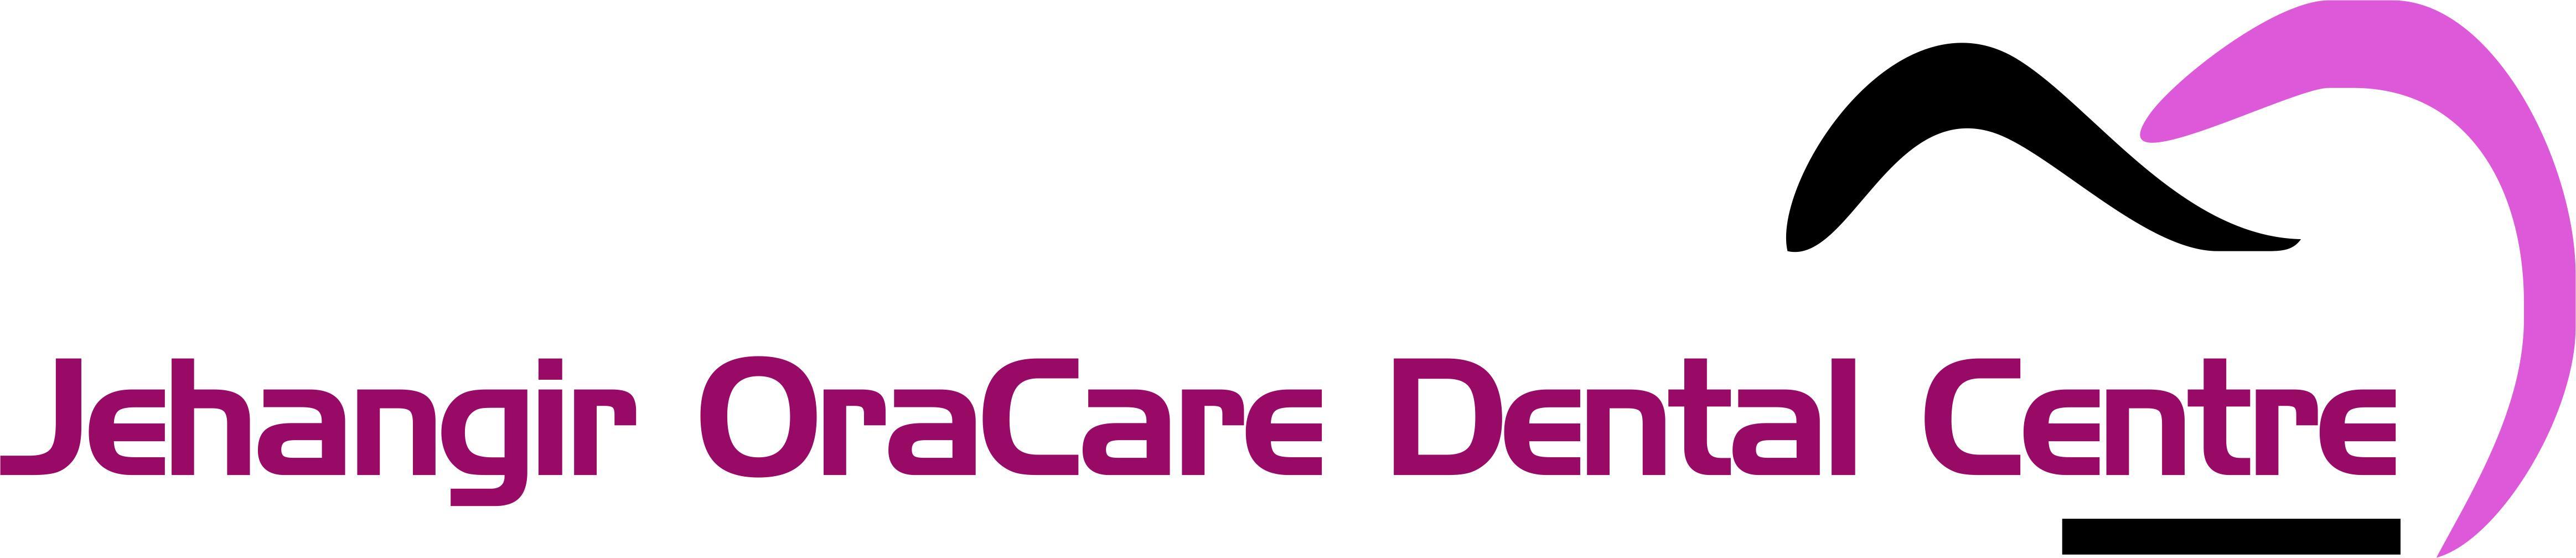 Jehangir Oracare Dental Centre